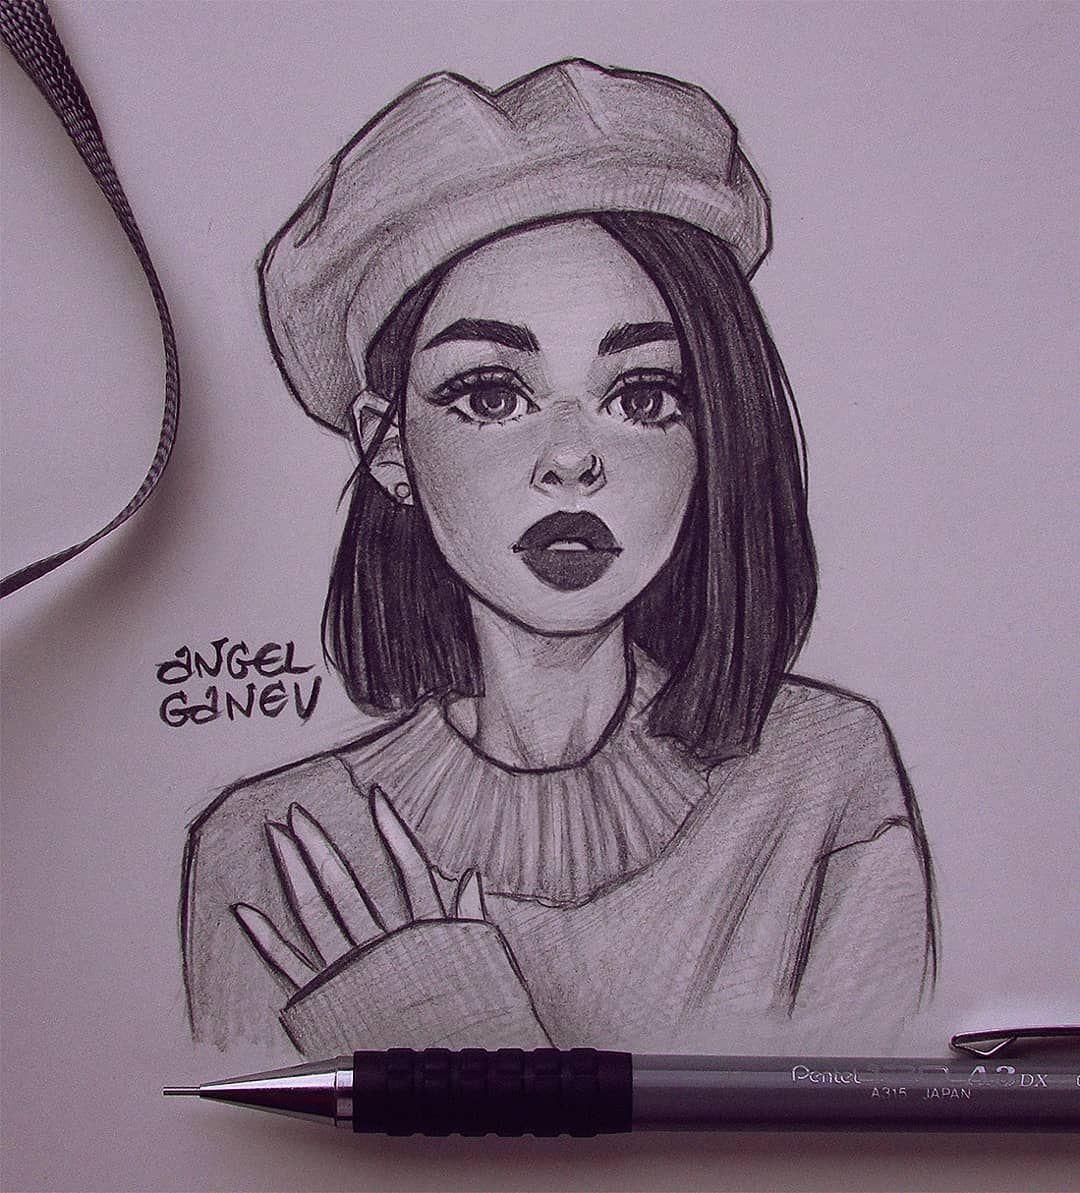 Art Sketches Art Sketches Easy Art Sketches Aesthetic Art Sketches Pencil In 2020 Art Drawings Sketches Simple Girl Drawing Sketches Art Drawings Sketches Creative